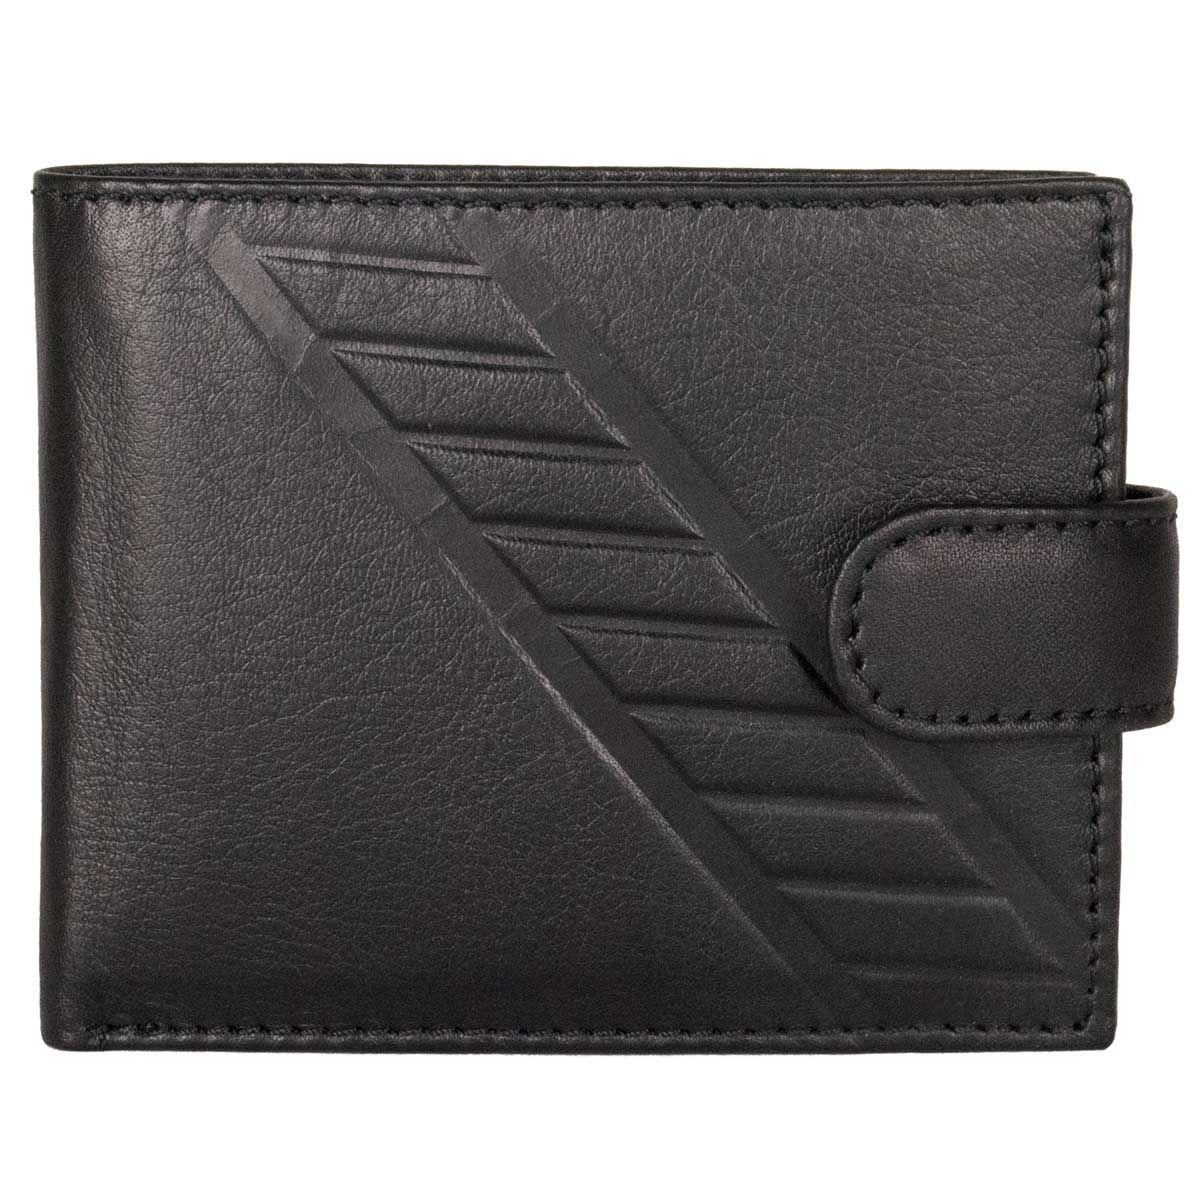 Leather wallet Montevita in Black